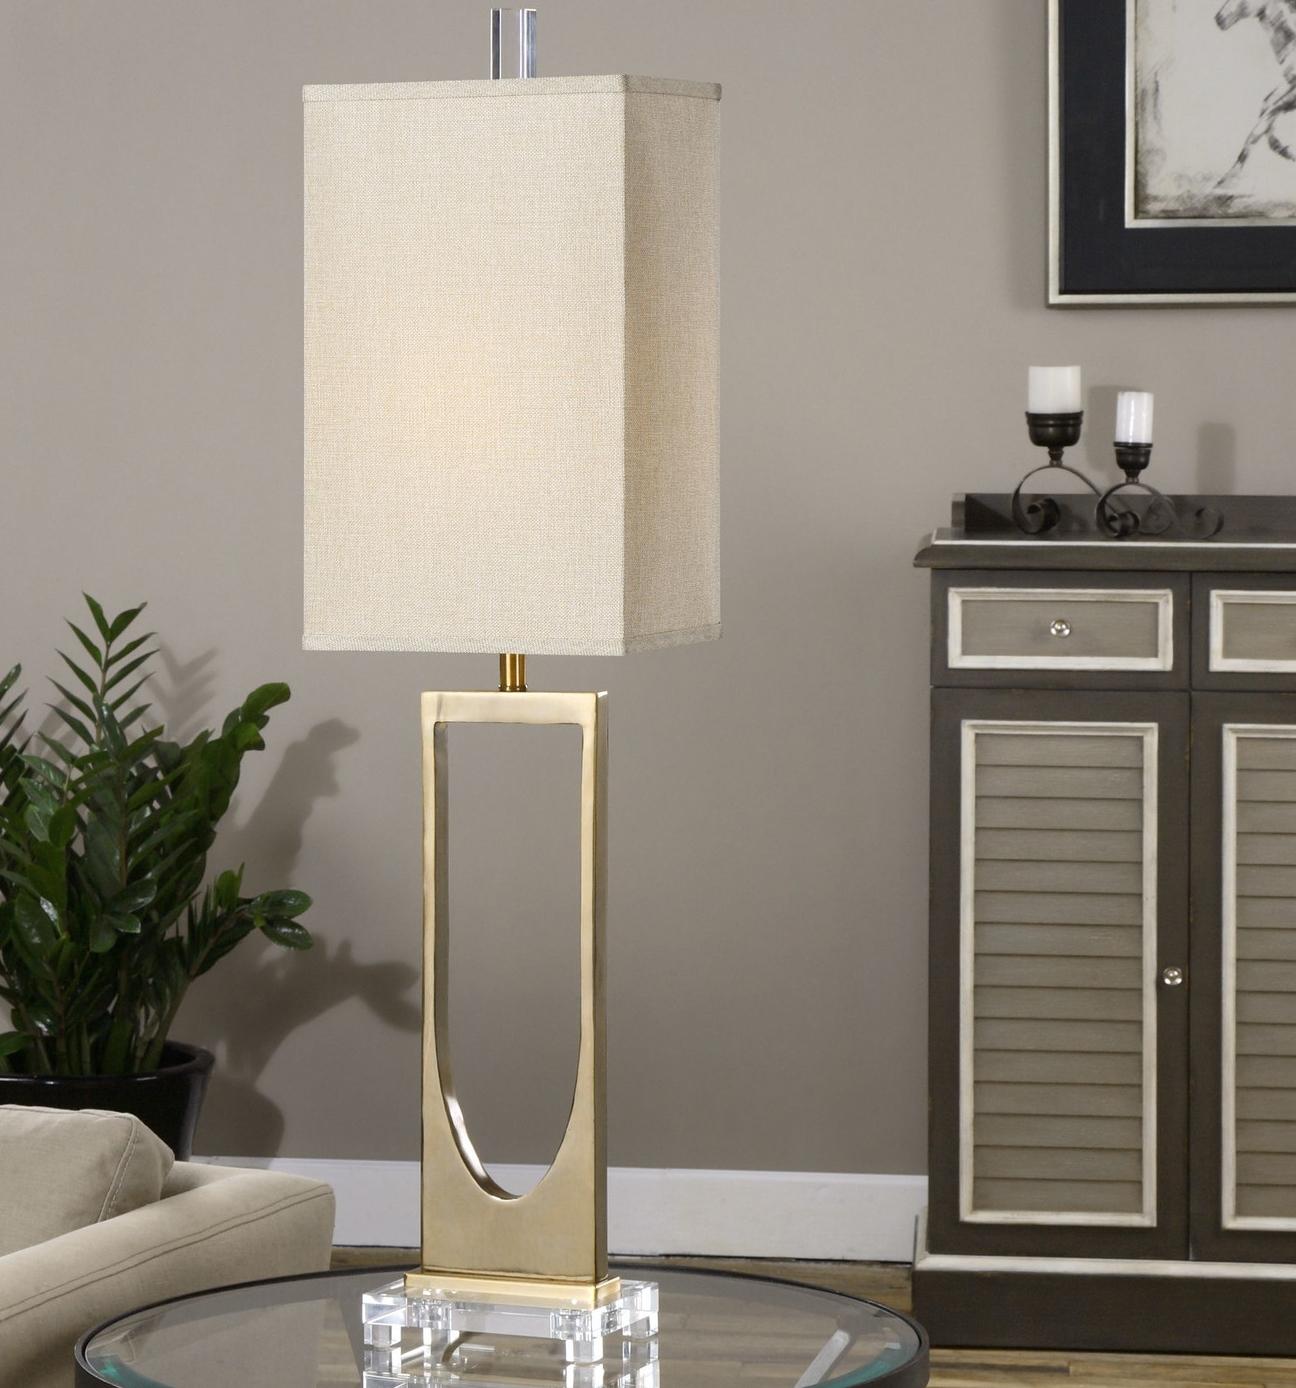 Genivolta-38.25-H-Table-Lamp-with-Rectangle-Shade-29193-1.jpg